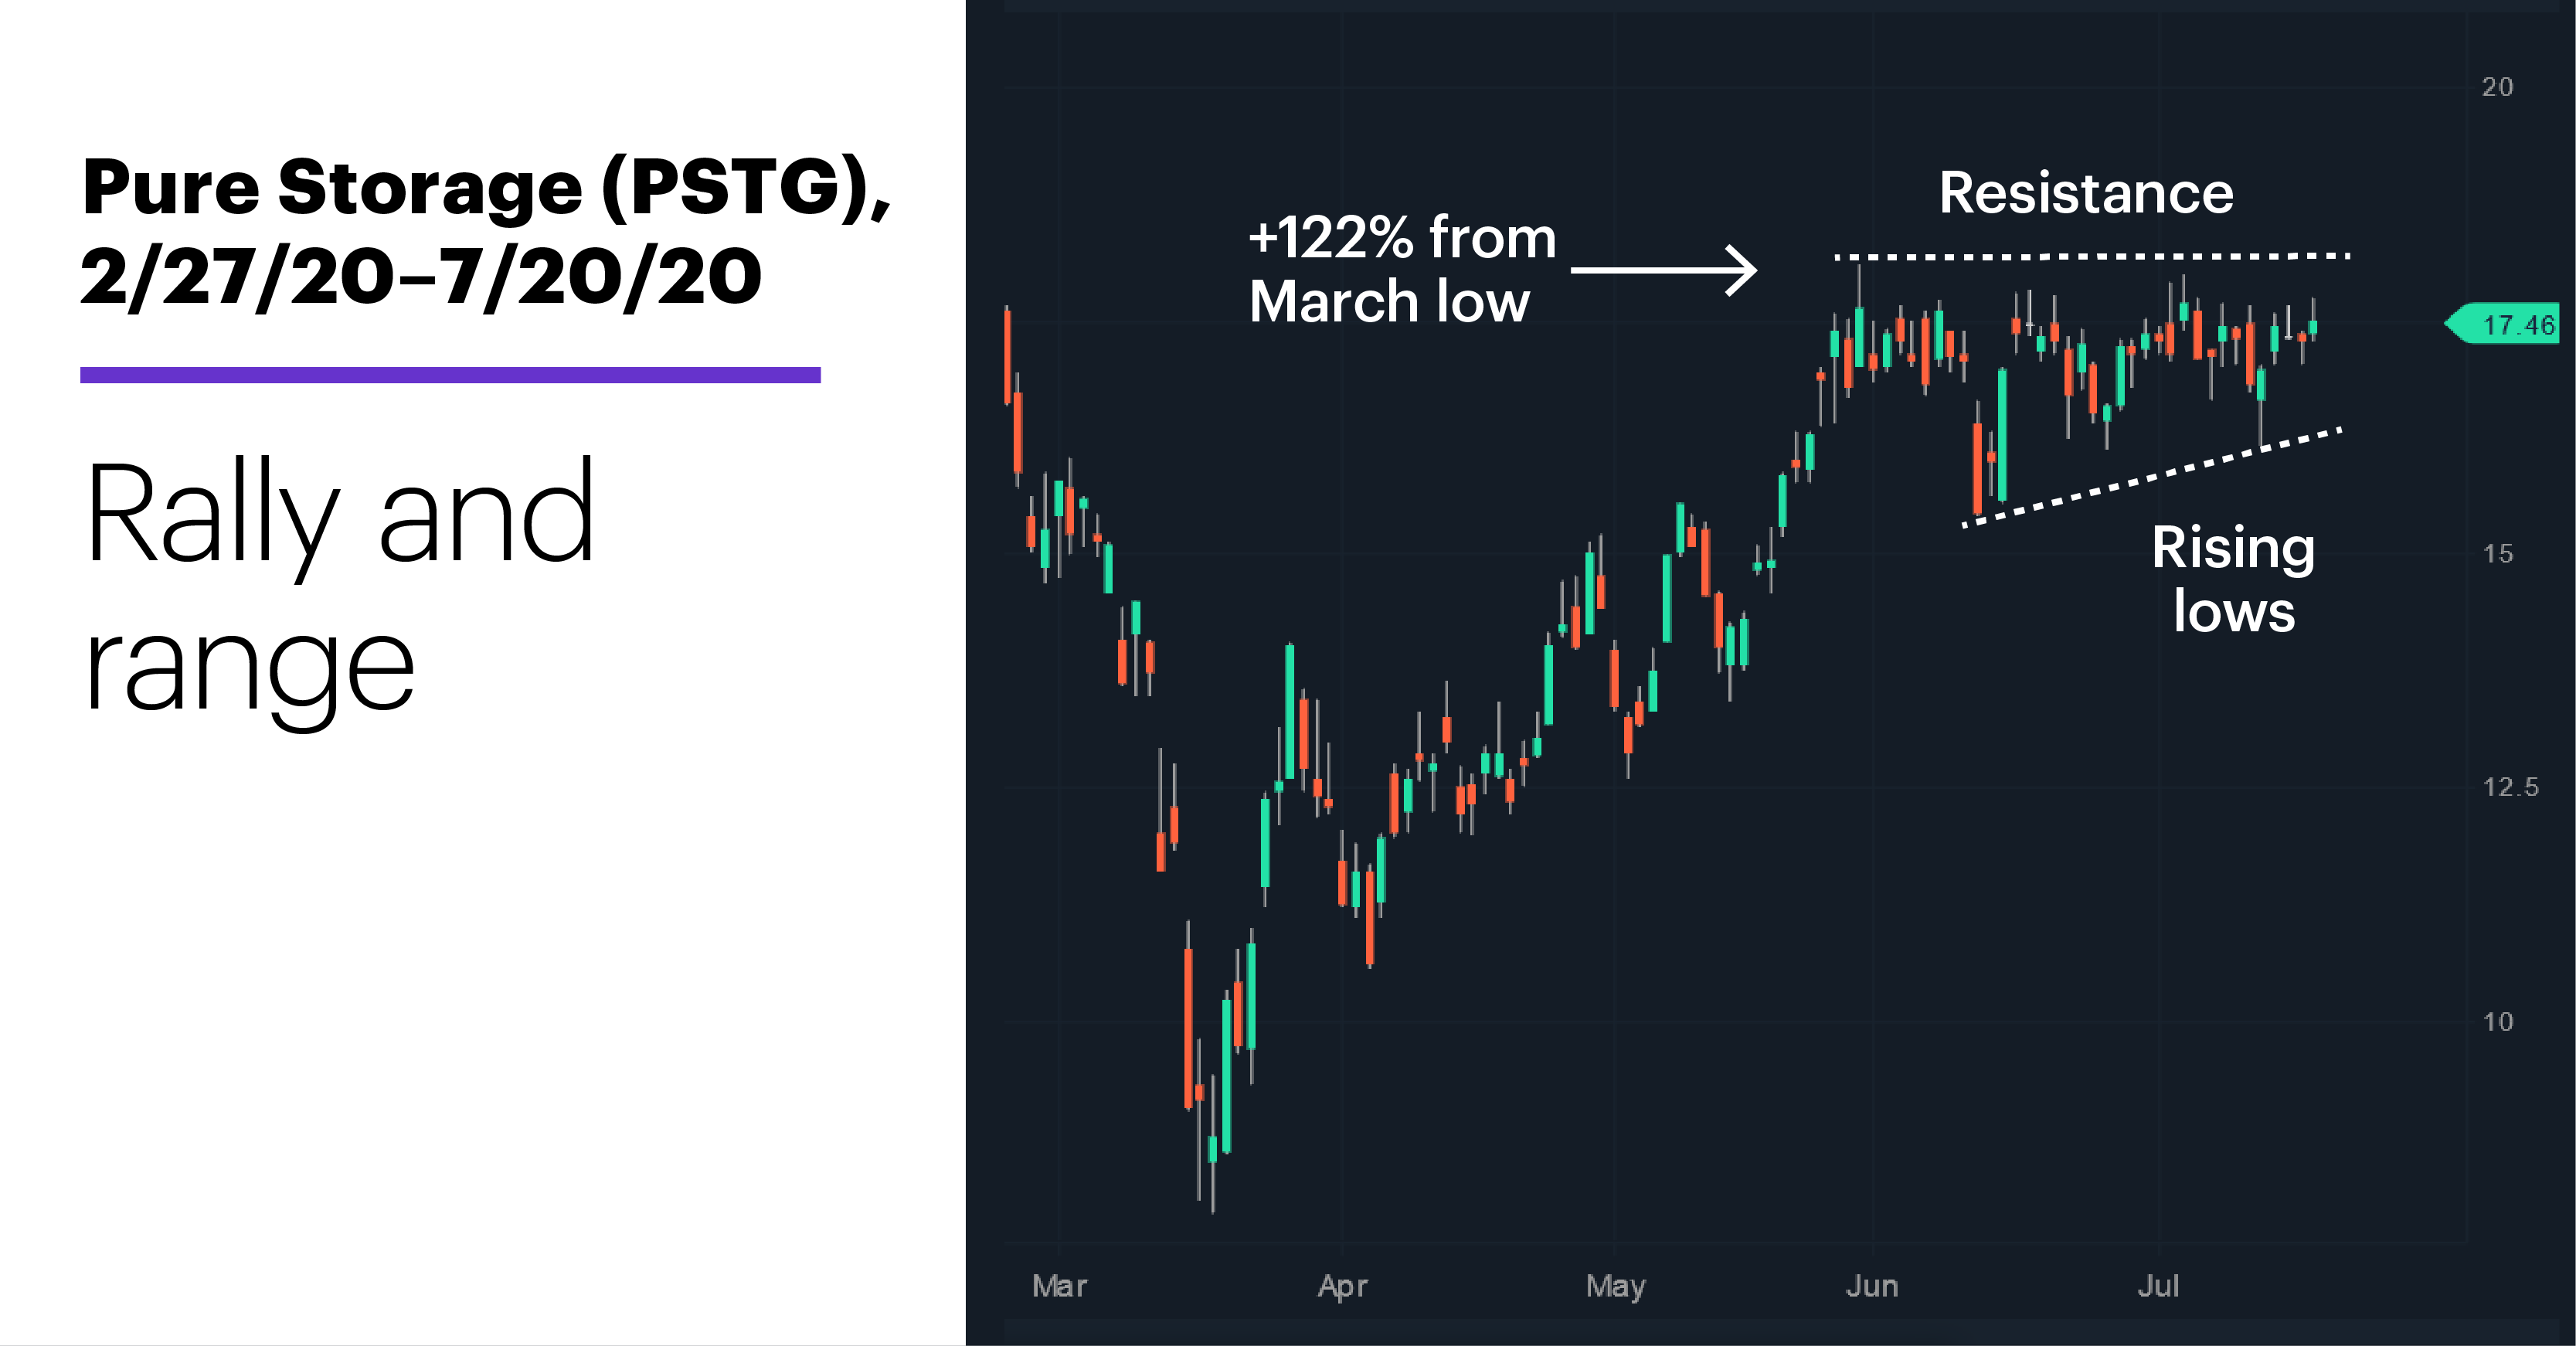 Chart 1: Pure Storage (PSTG), 2/27/20–7/20/20. Pure Storage (PSTG) price chart. Rally and range.